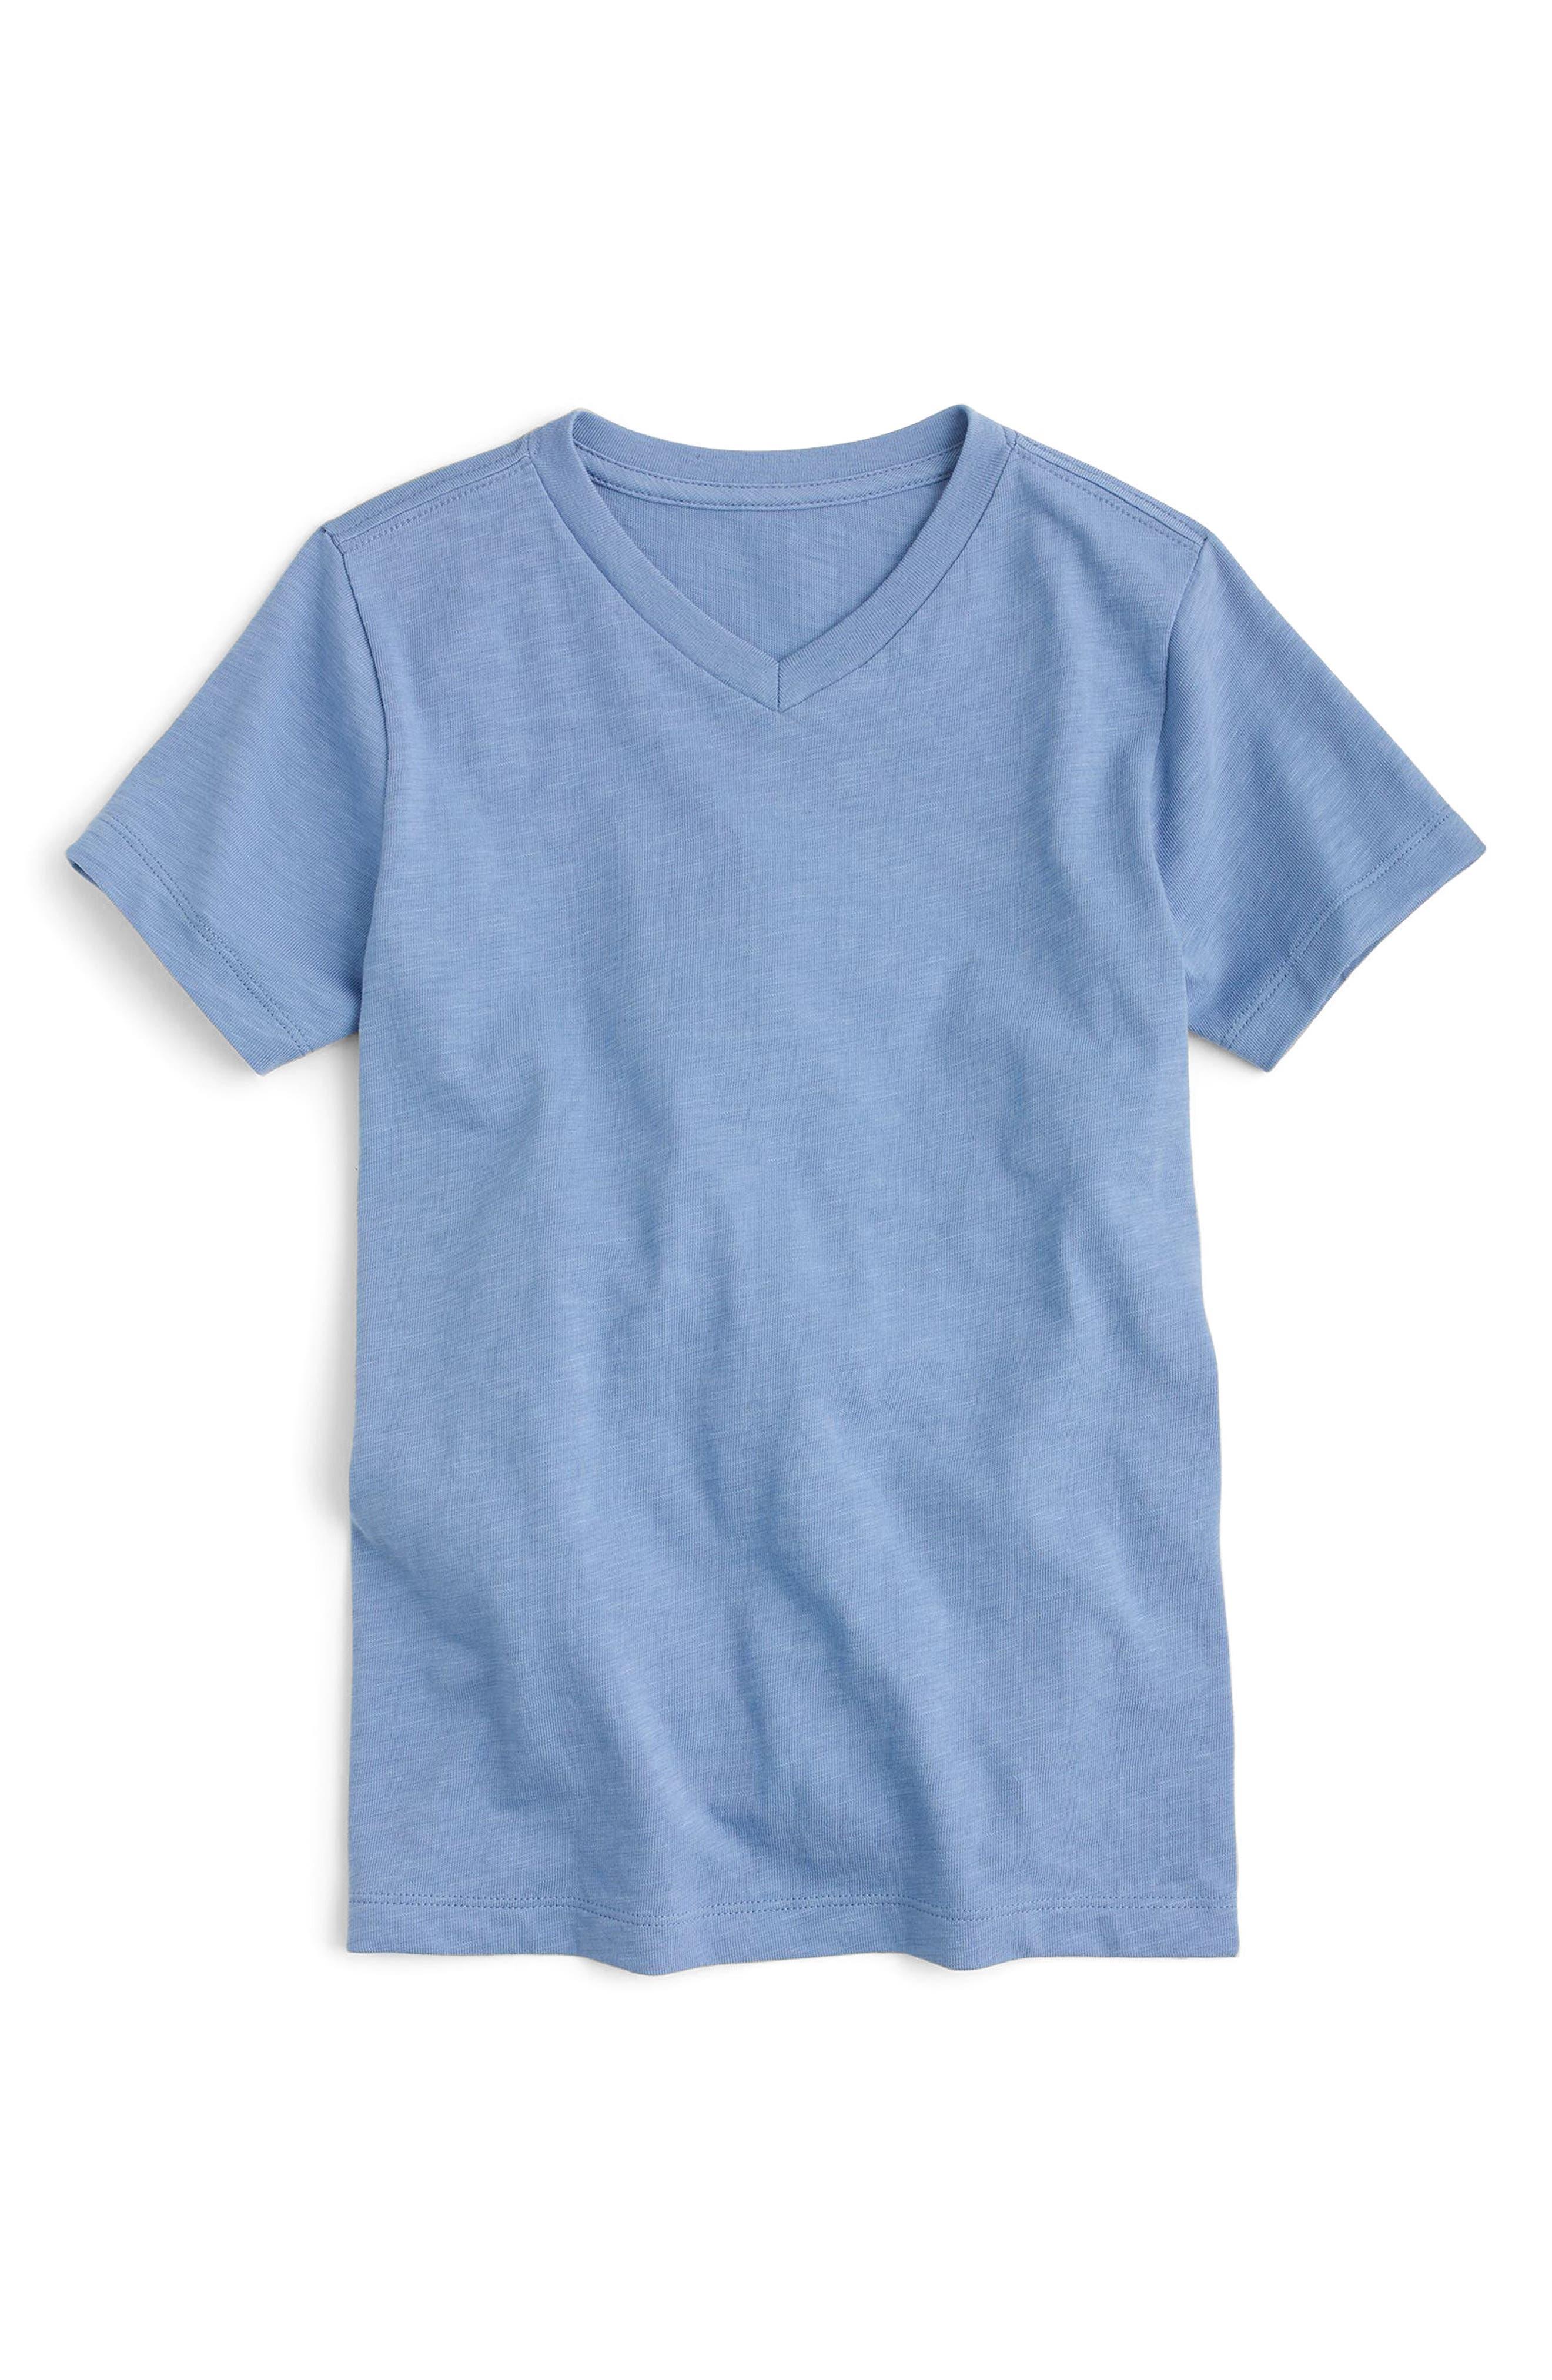 crewcuts by J.Crew V-Neck T-Shirt (Toddler Boys, Little Boys & Big Boys)